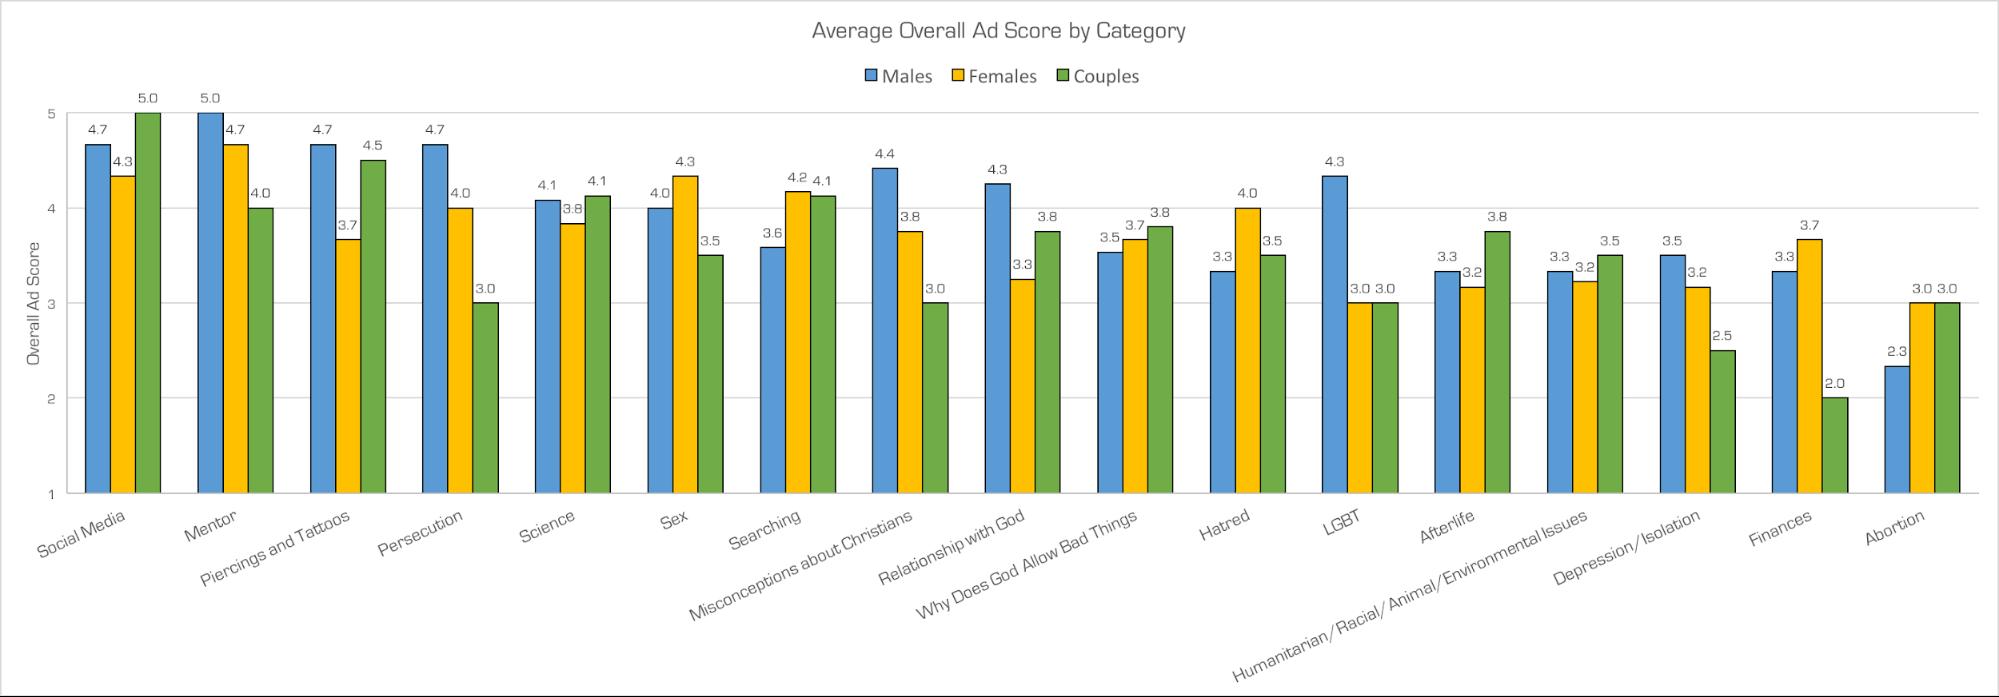 Church Millennial Focus Group Methodology graph